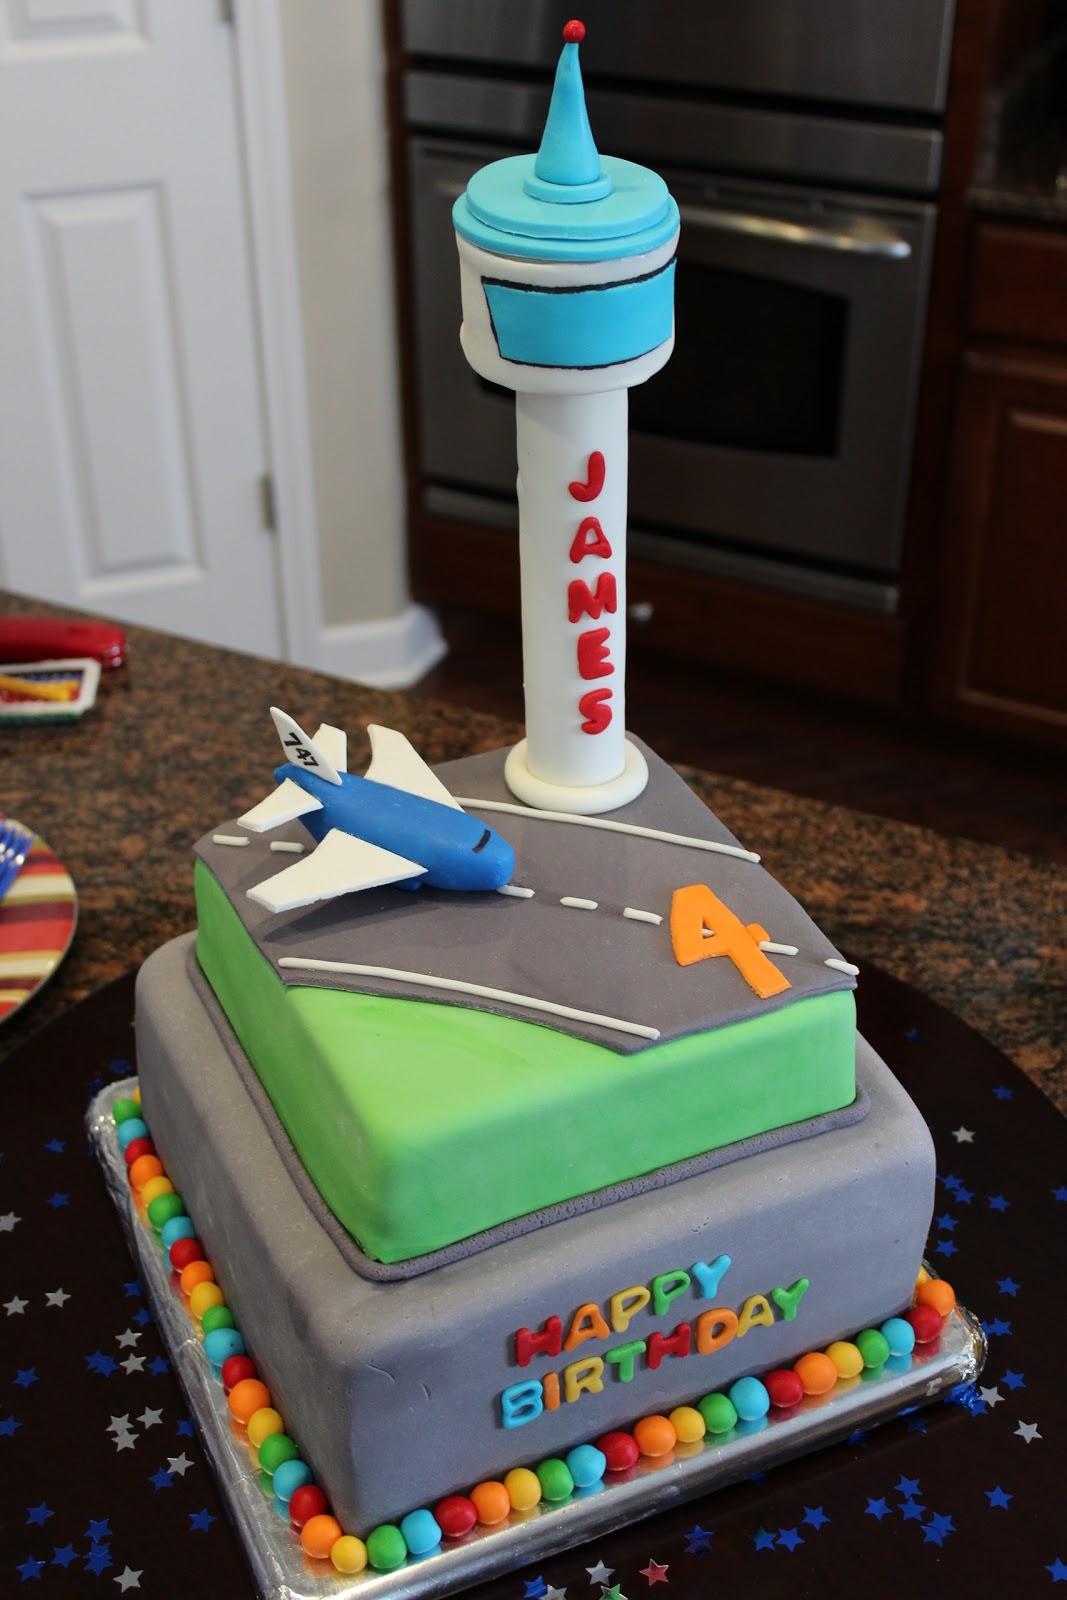 Cake Flair AirplaneAirport Cake